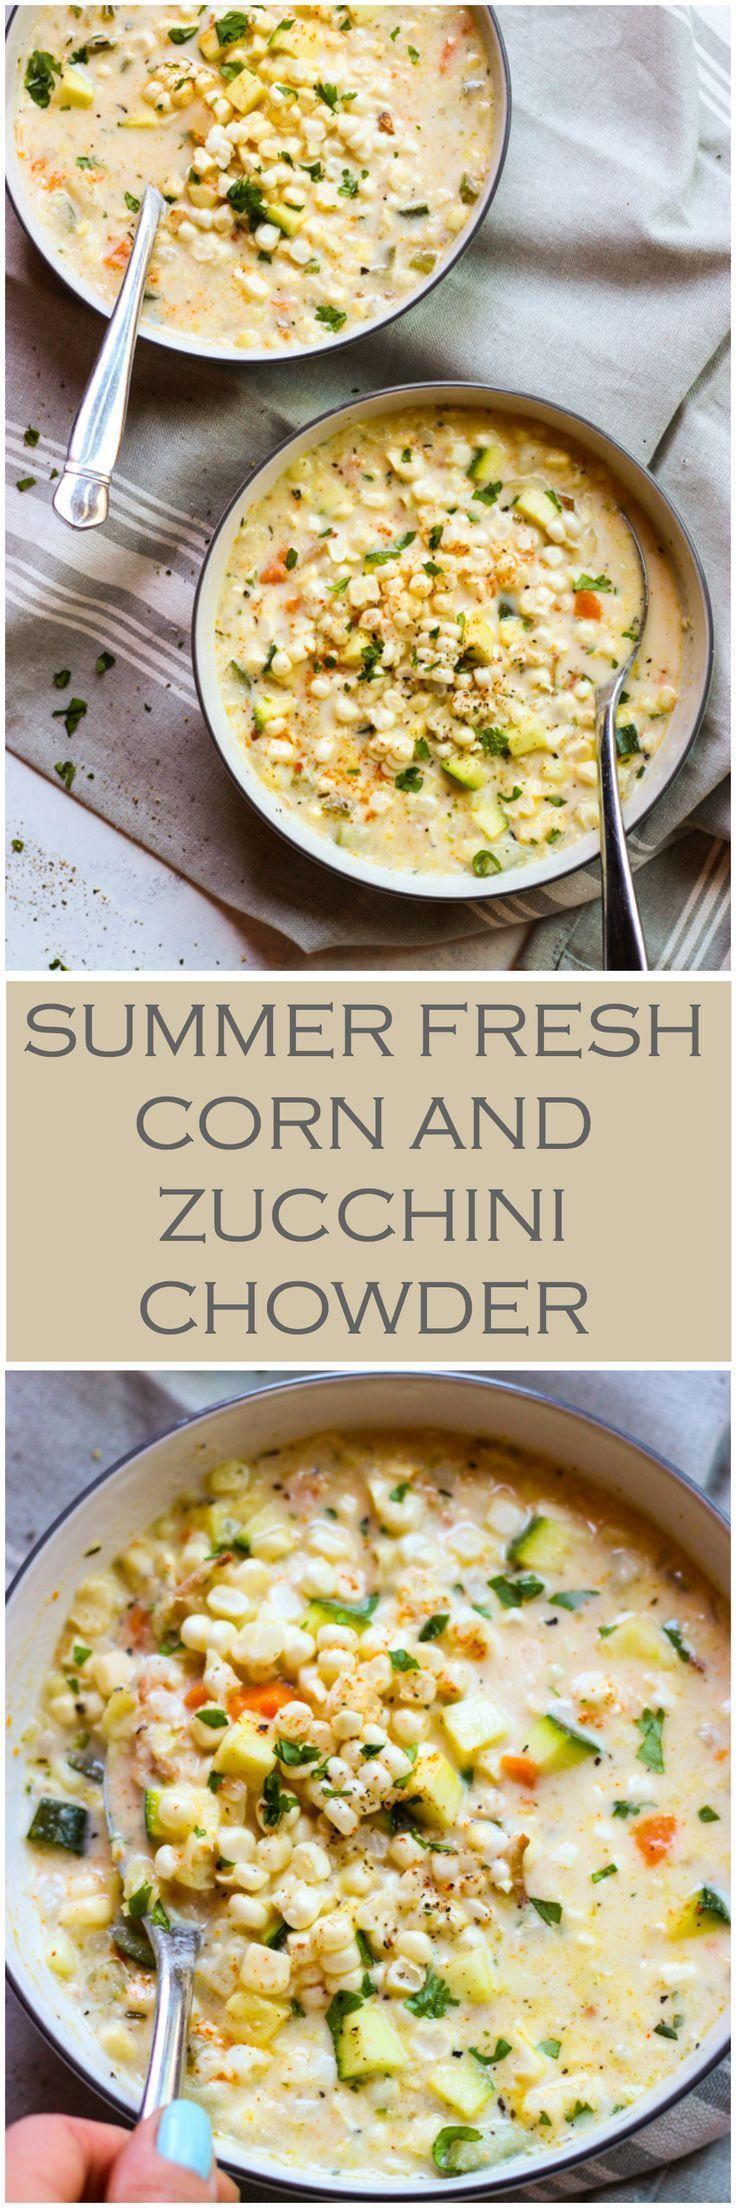 Summer Fresh Corn and Zucchini Chowder - the BEST healthy chowder! At only 173 calories, NO flour, NO heavy cream   http://littlebroken.com /littlebroken/